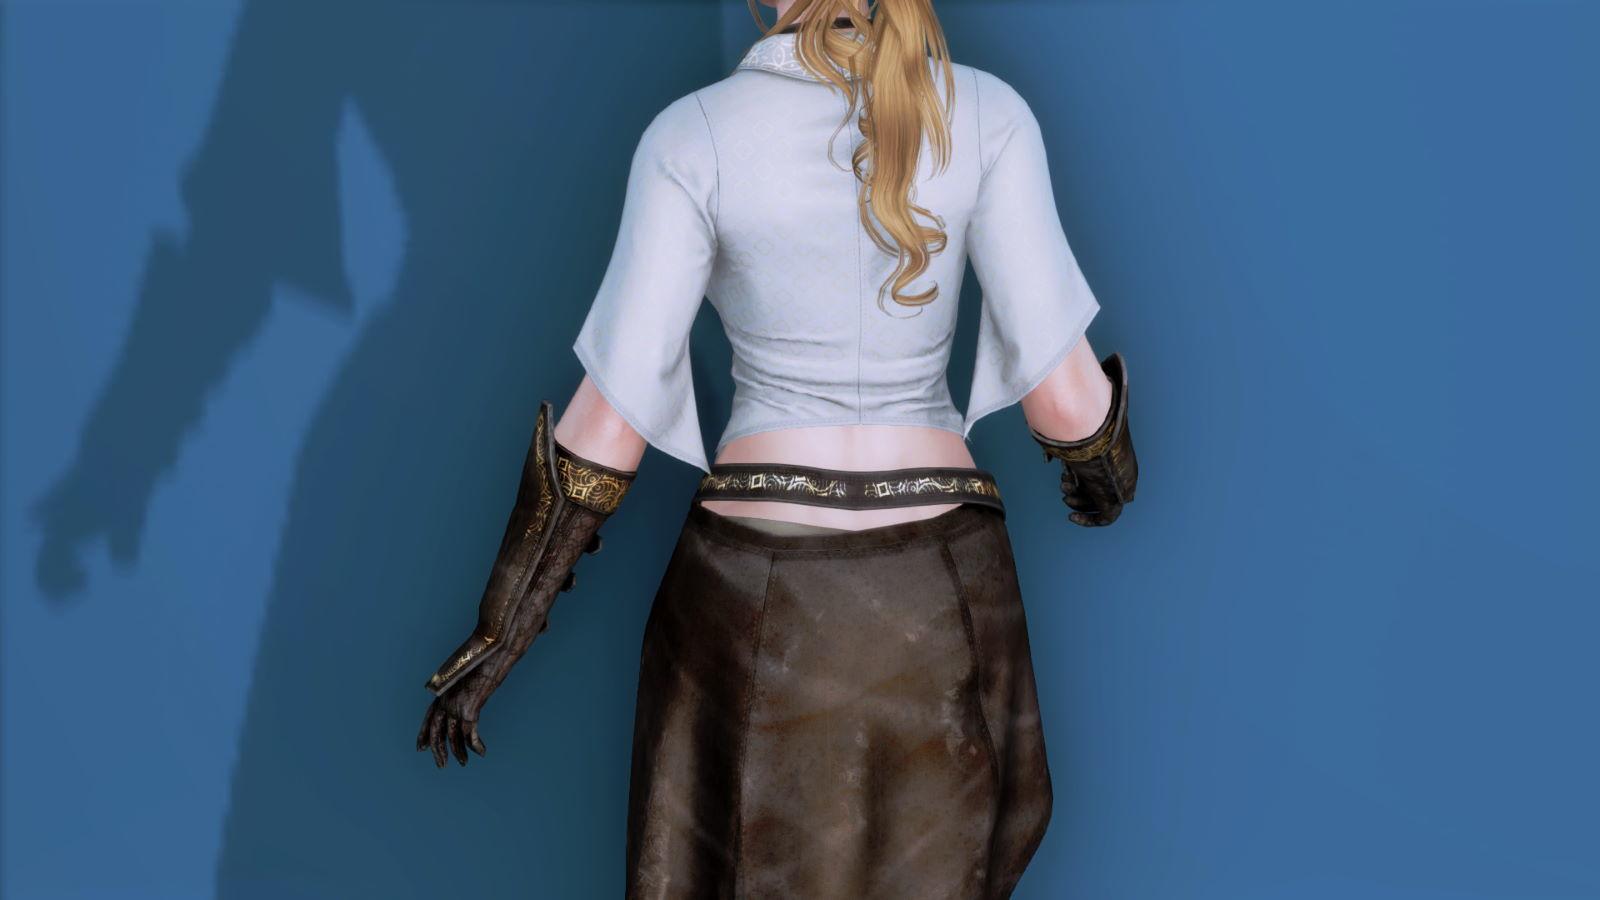 RuggedRogueSSE 113-1 Pose Up-Ba-F Blouse Skirt 1